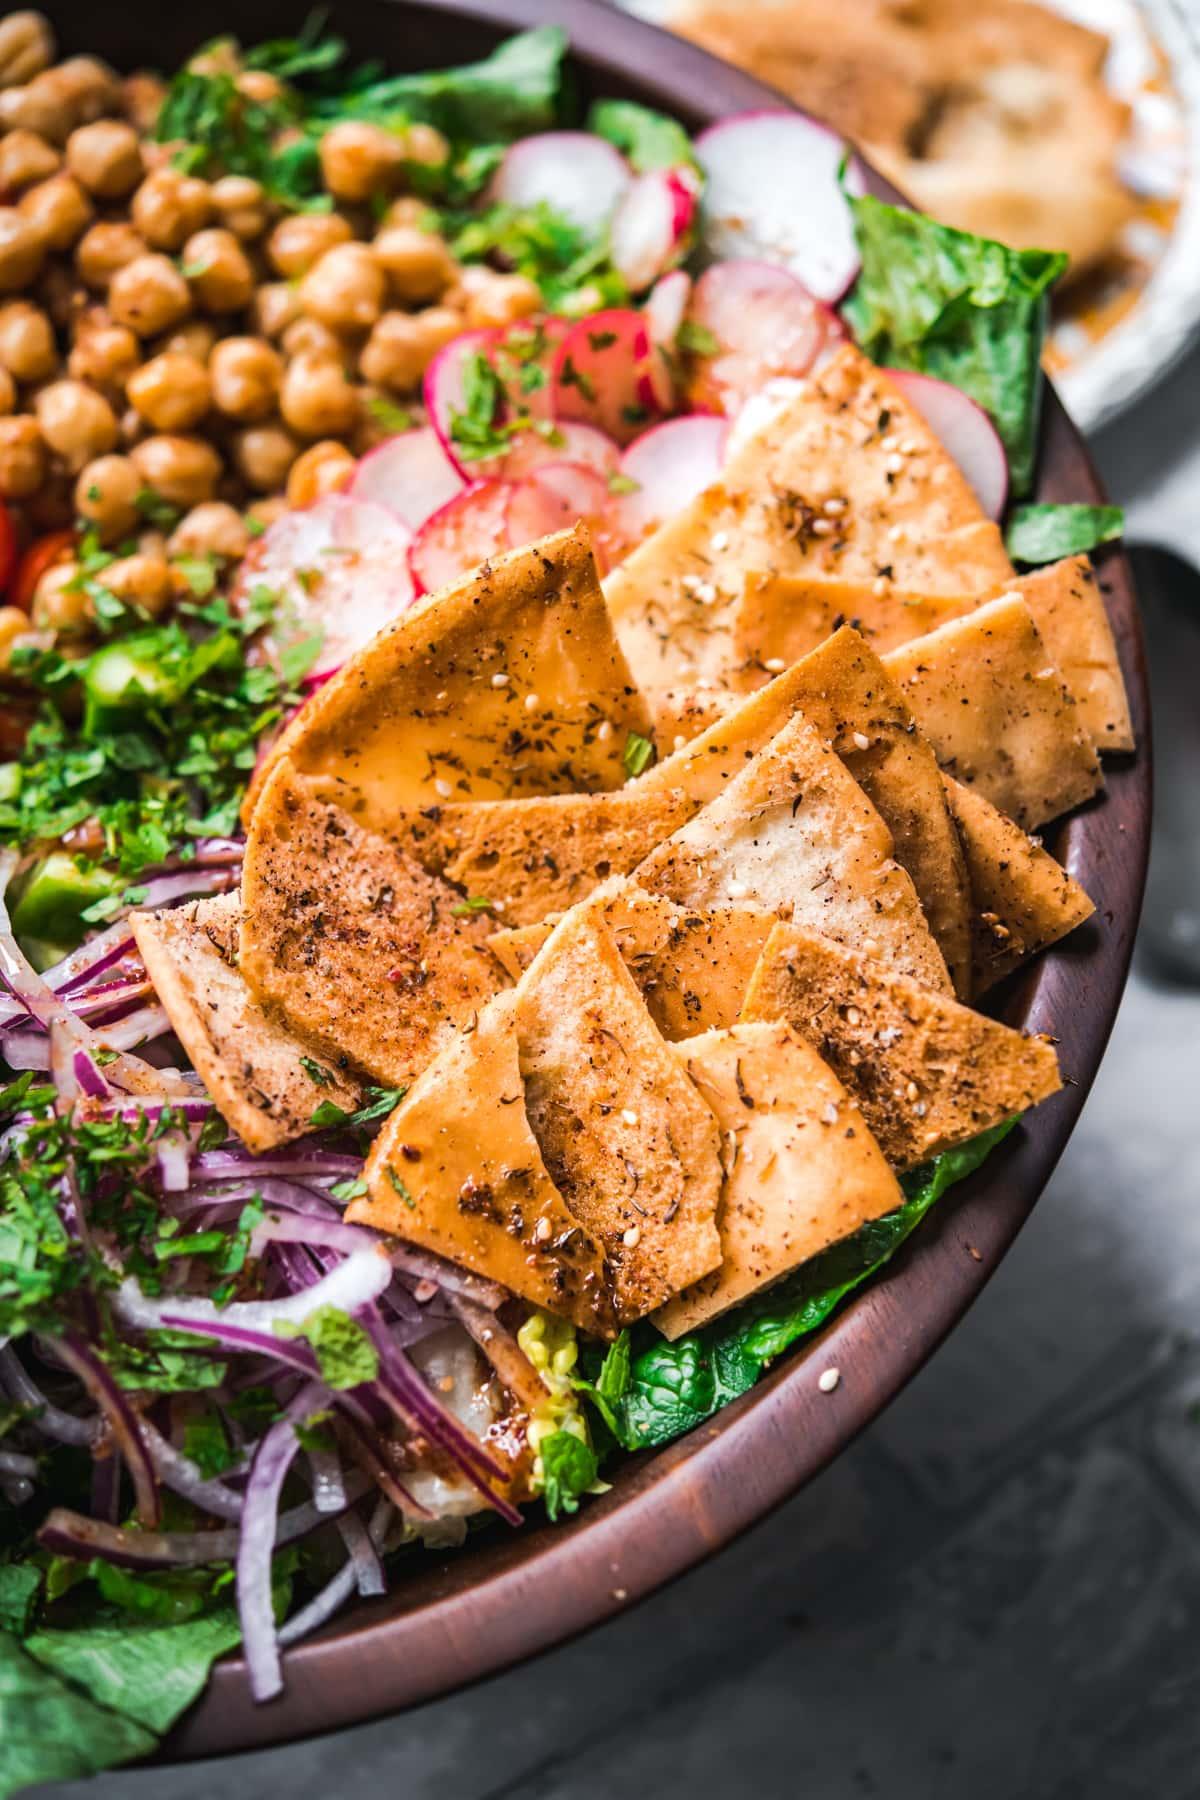 close up view of za'atar spiced pita chips on fattoush salad.